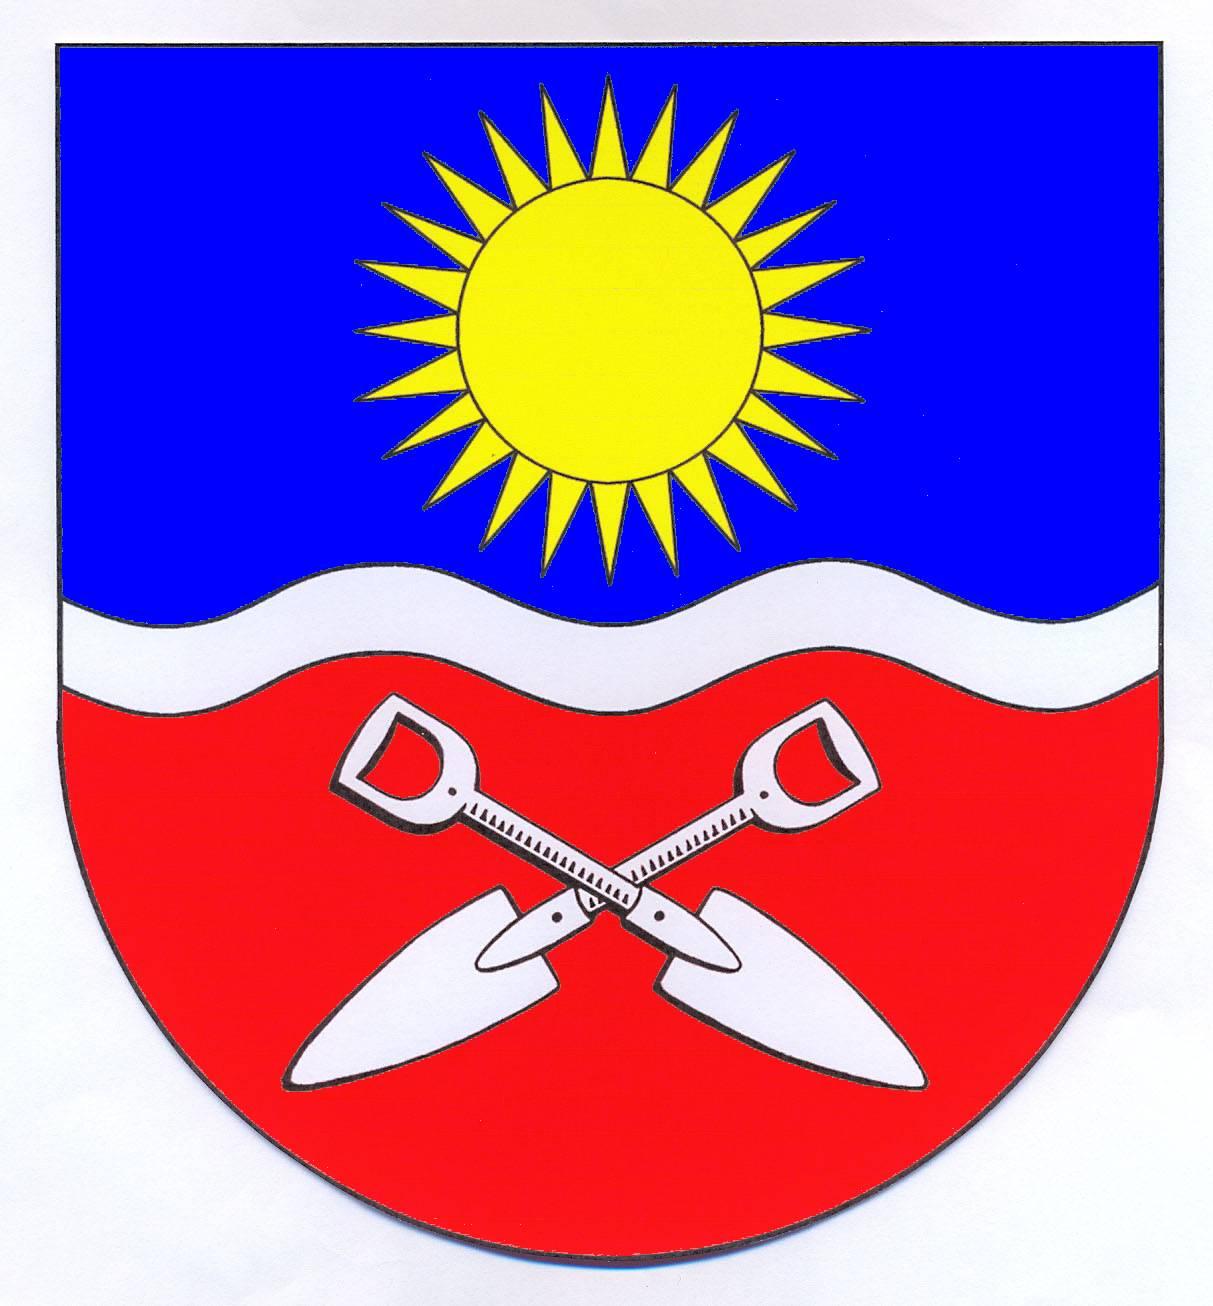 Wappen GemeindeSchönbek, Kreis Rendsburg-Eckernförde